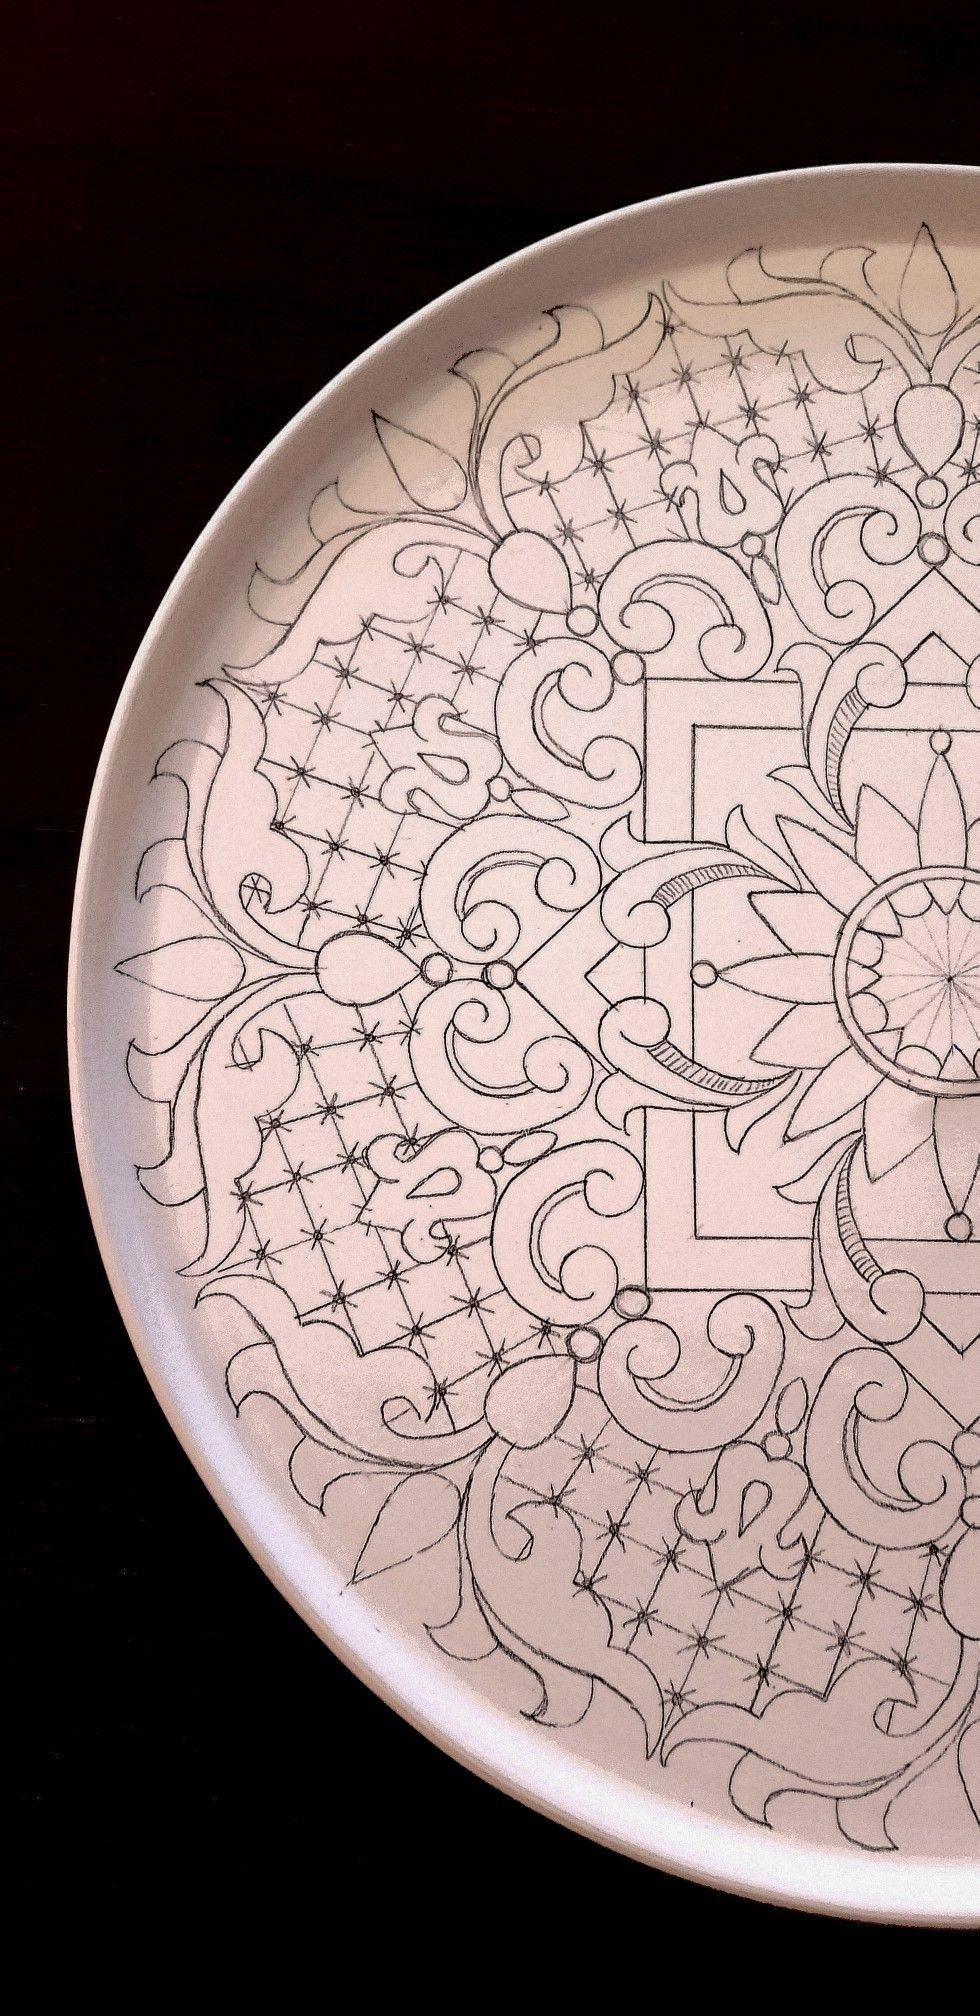 Prato Desenho  Lu Heringer #floconsdeneigeenpapier